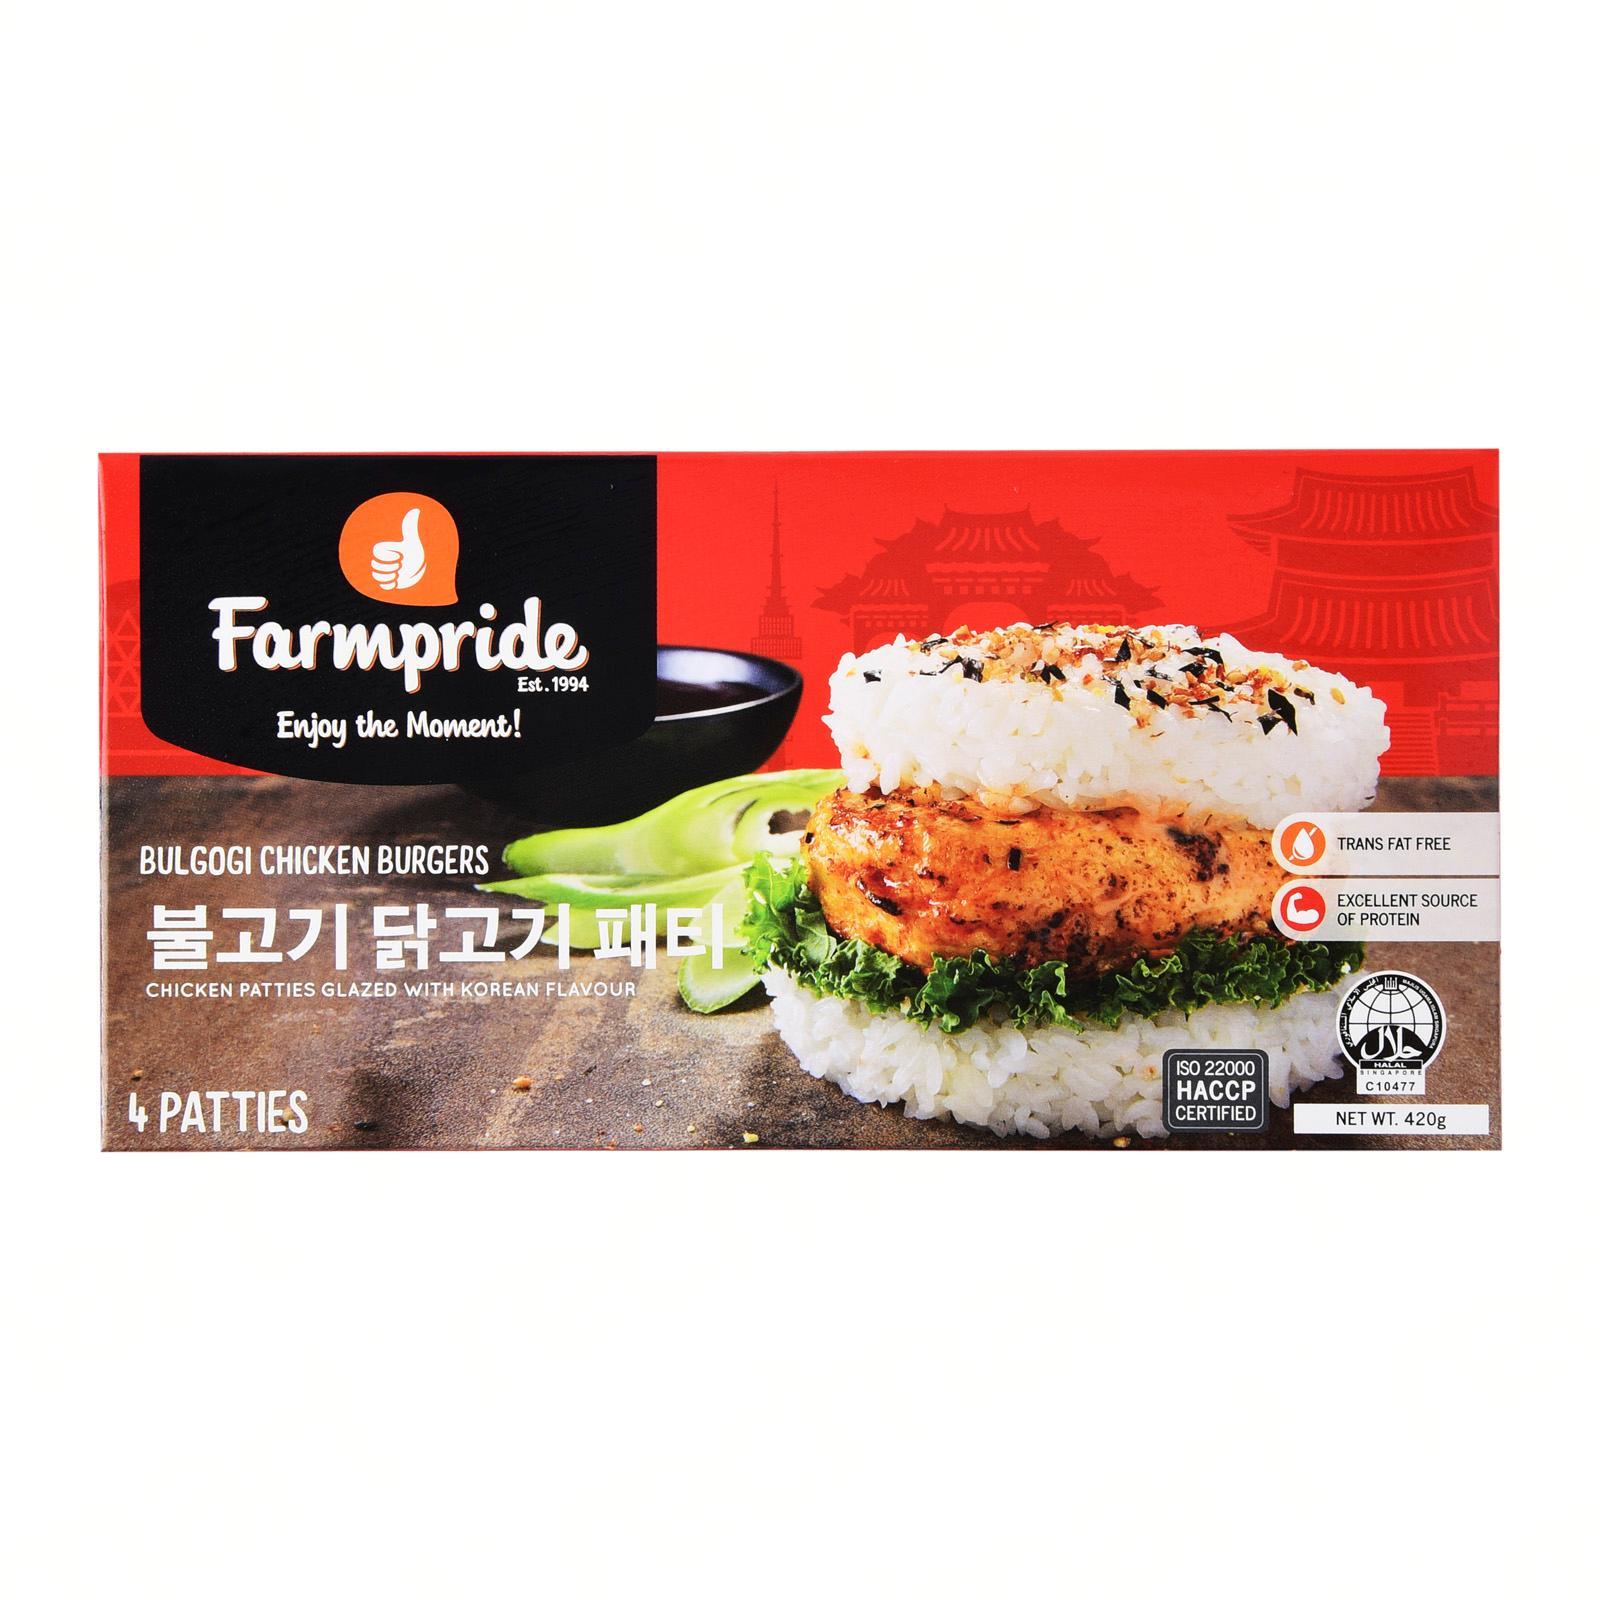 Farmpride Bulgogi Chicken Burgers - Frozen